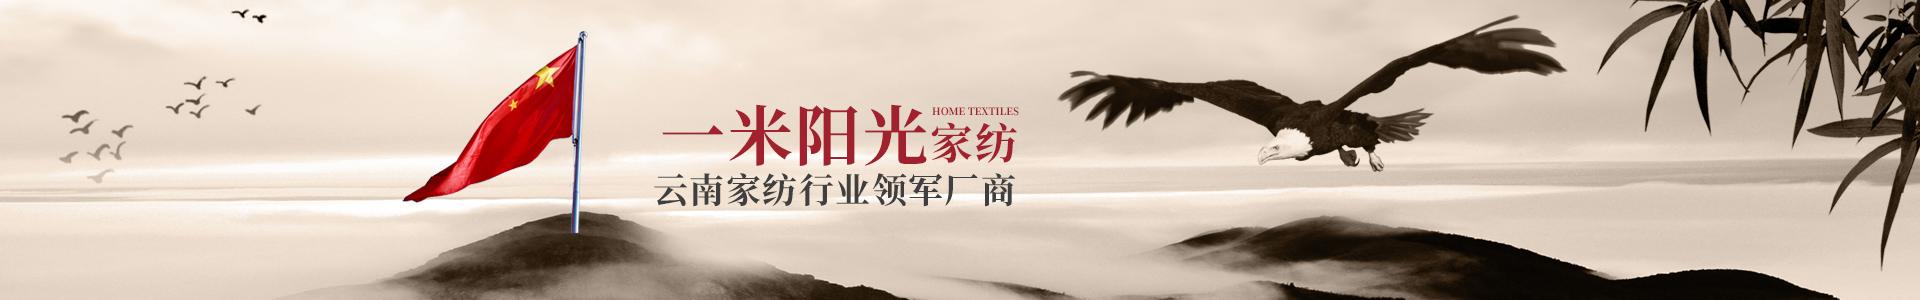 betway官网开户必威备用网站,云南必威备用网站行业领军厂商